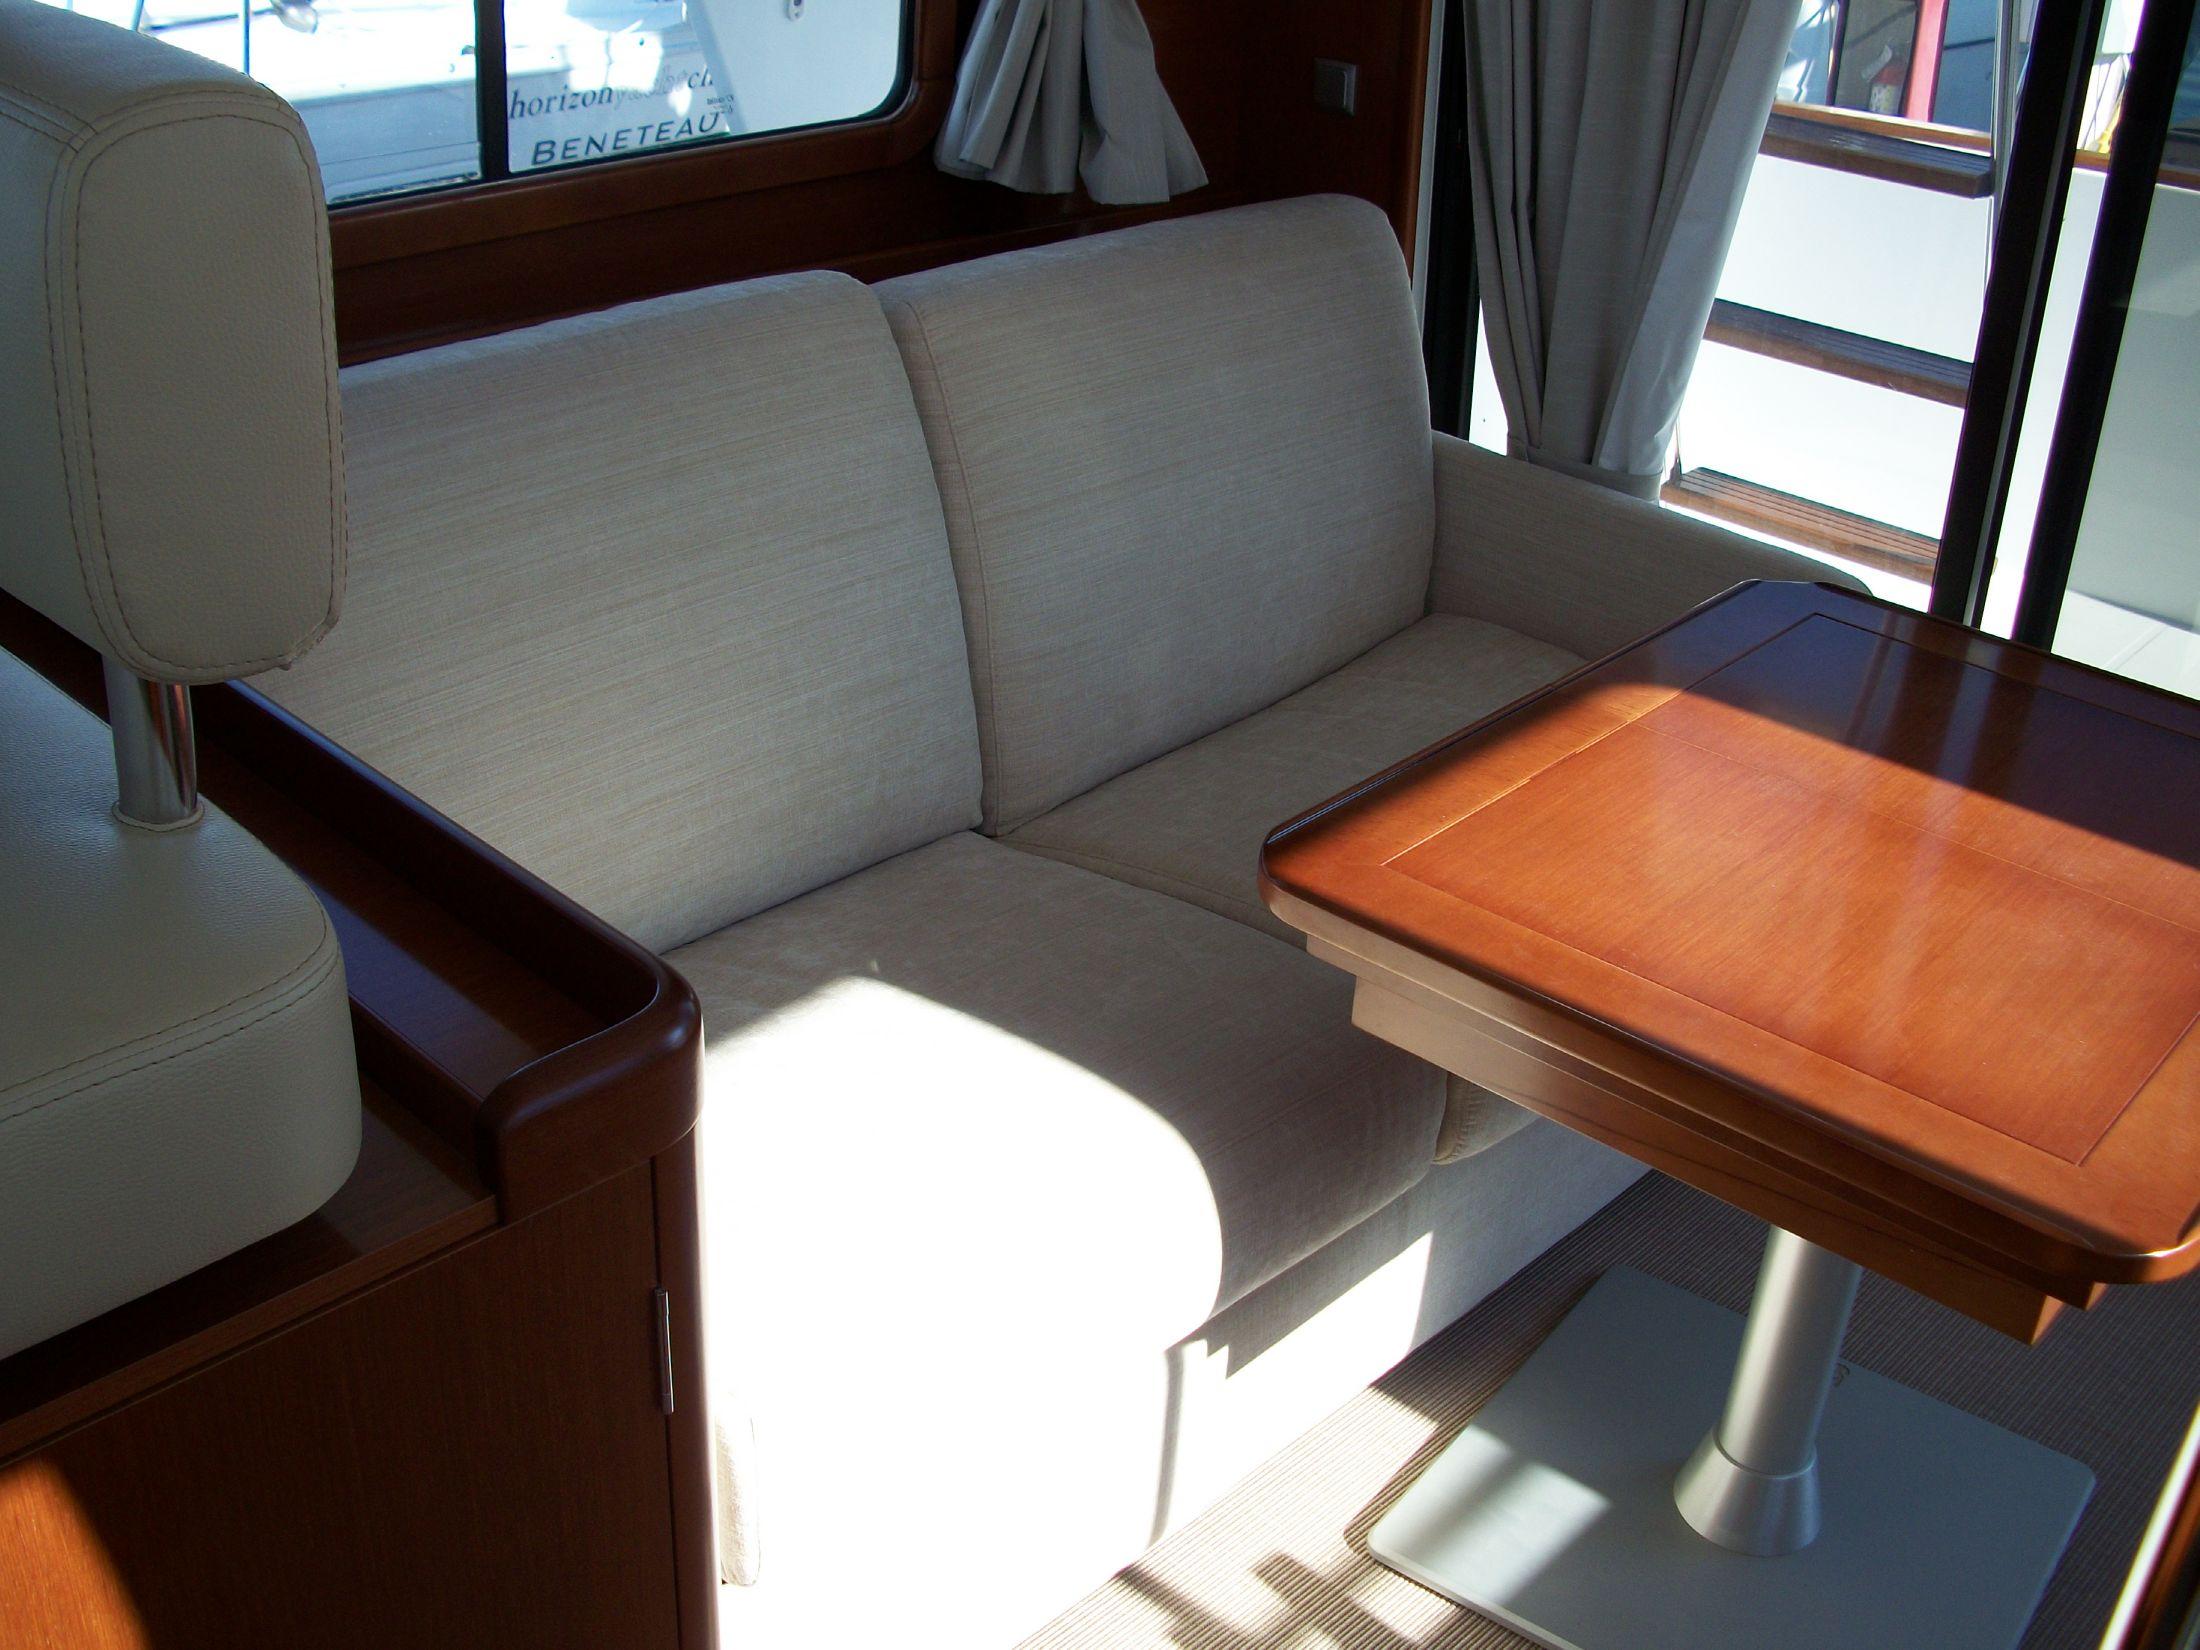 Salon settee/bed stbd side